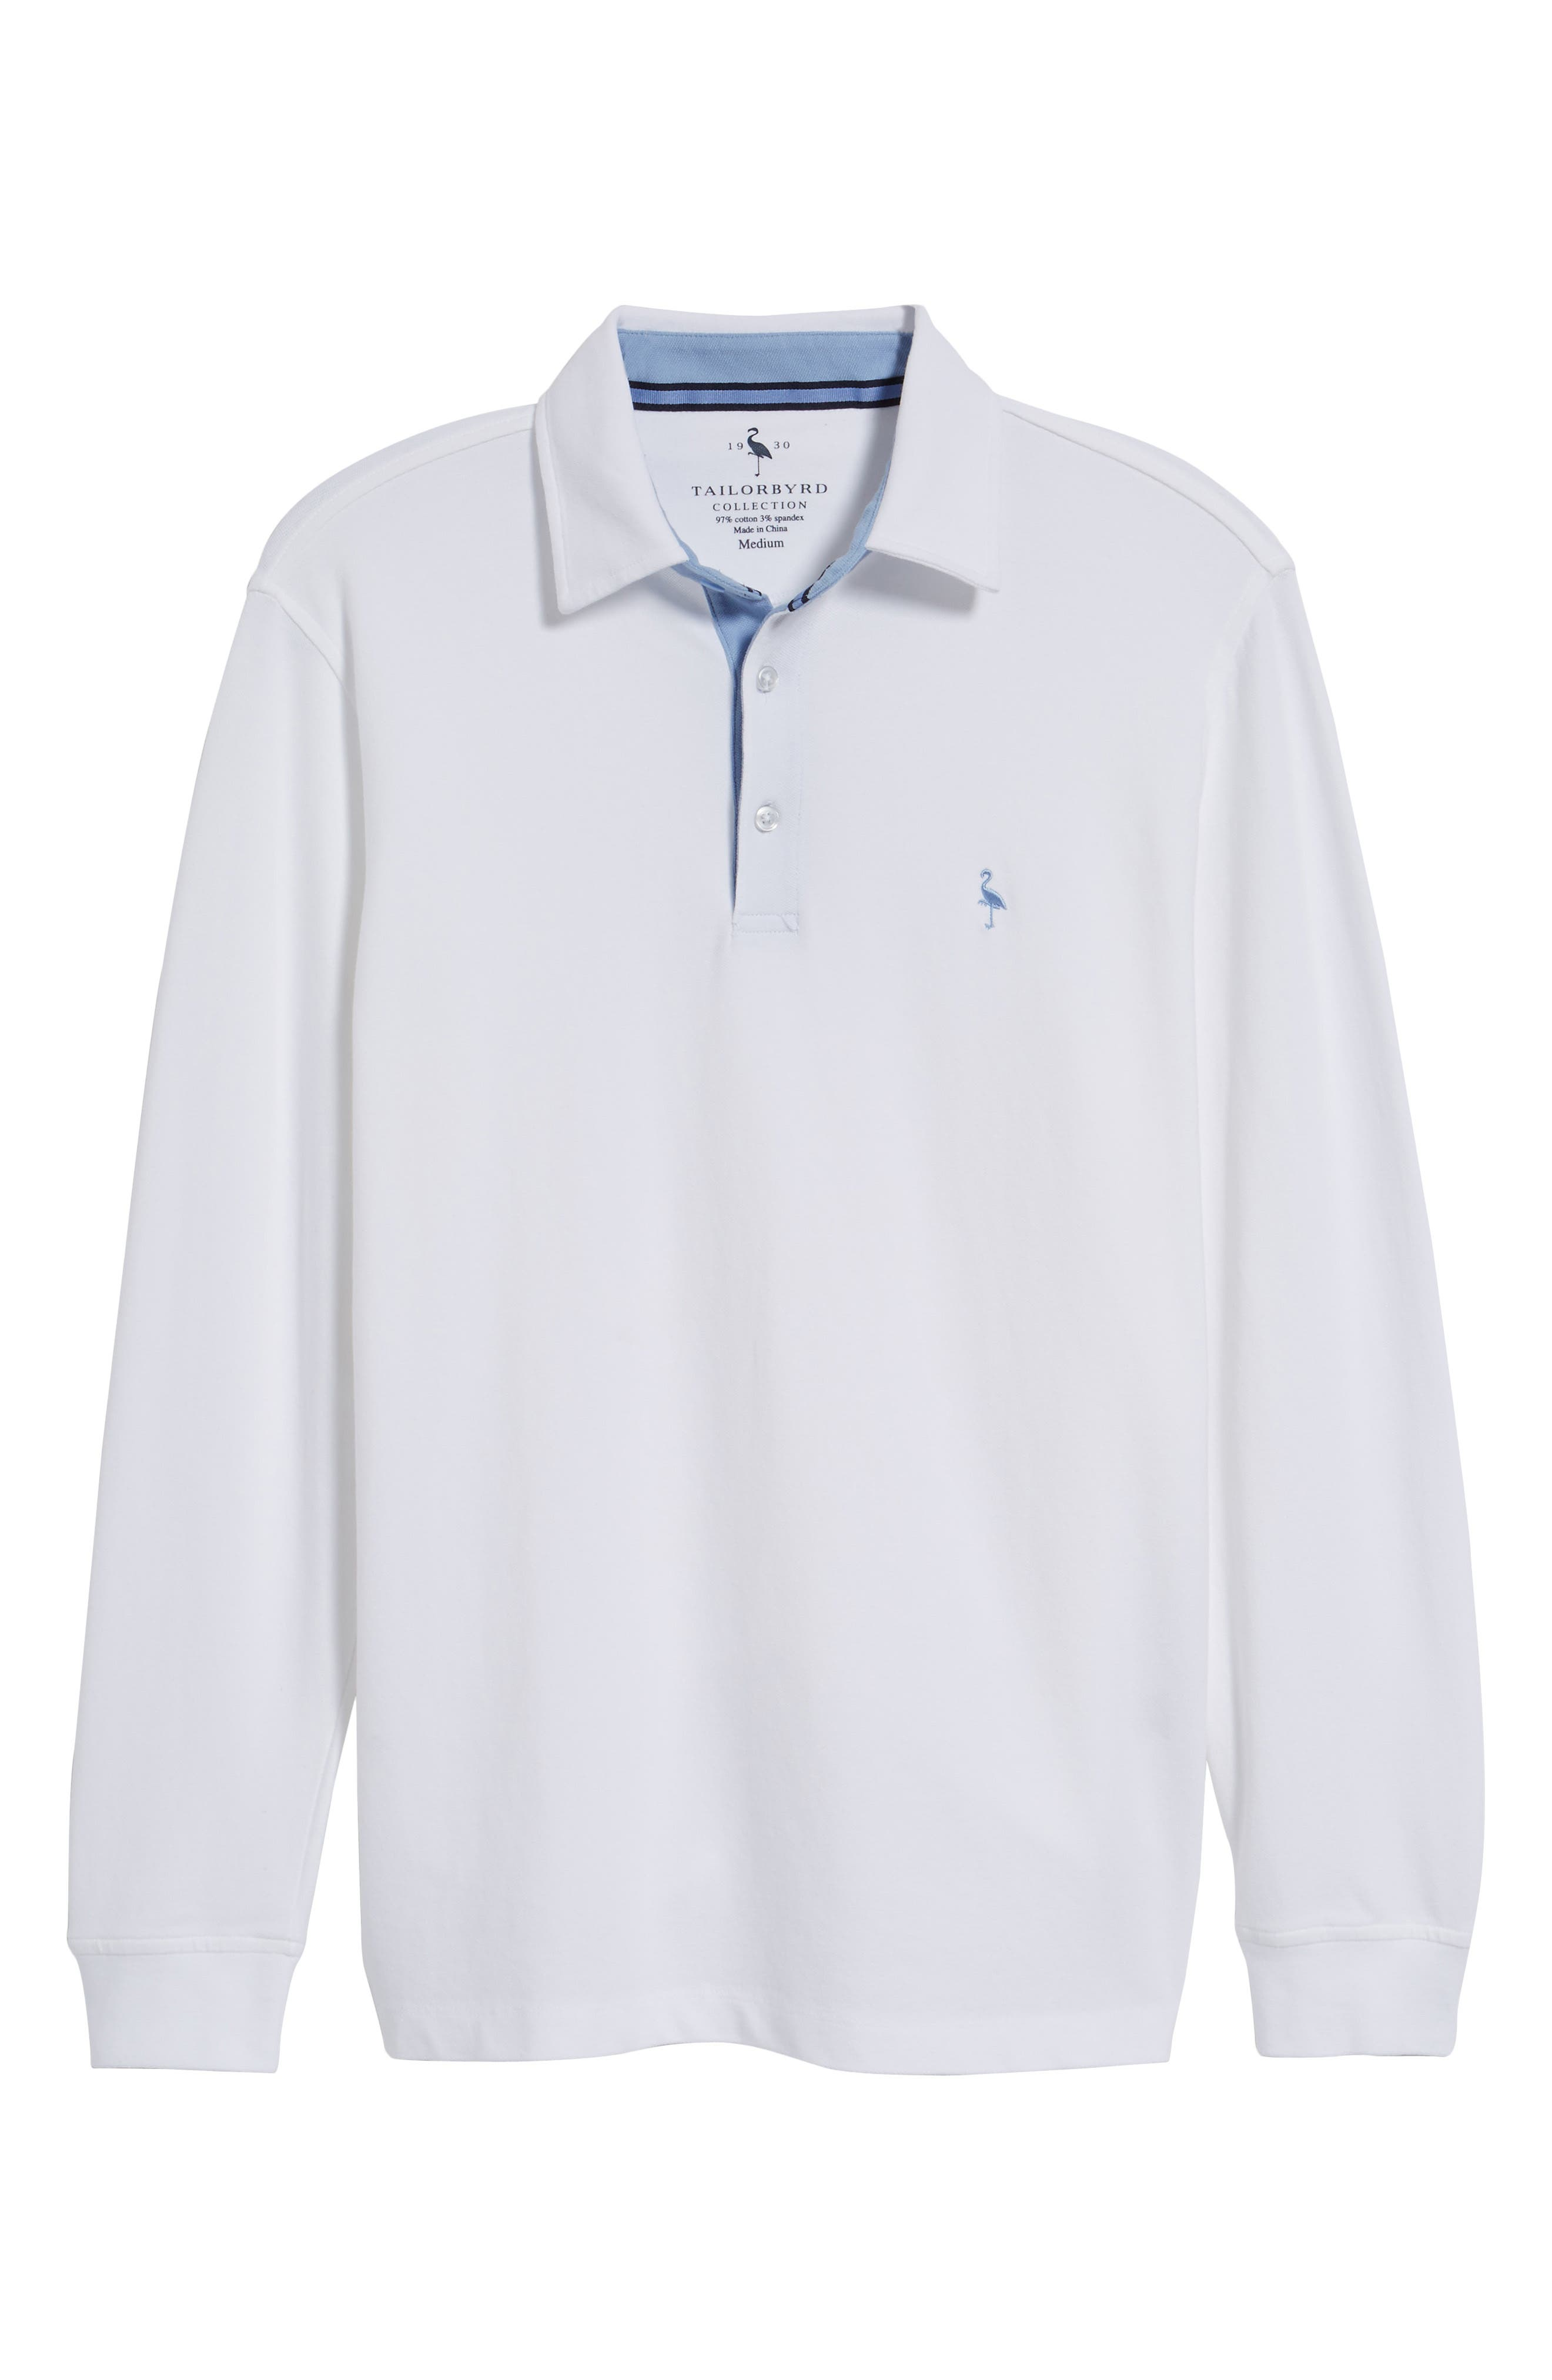 Two-Tone Piqué Knit Polo,                             Alternate thumbnail 6, color,                             Pure White